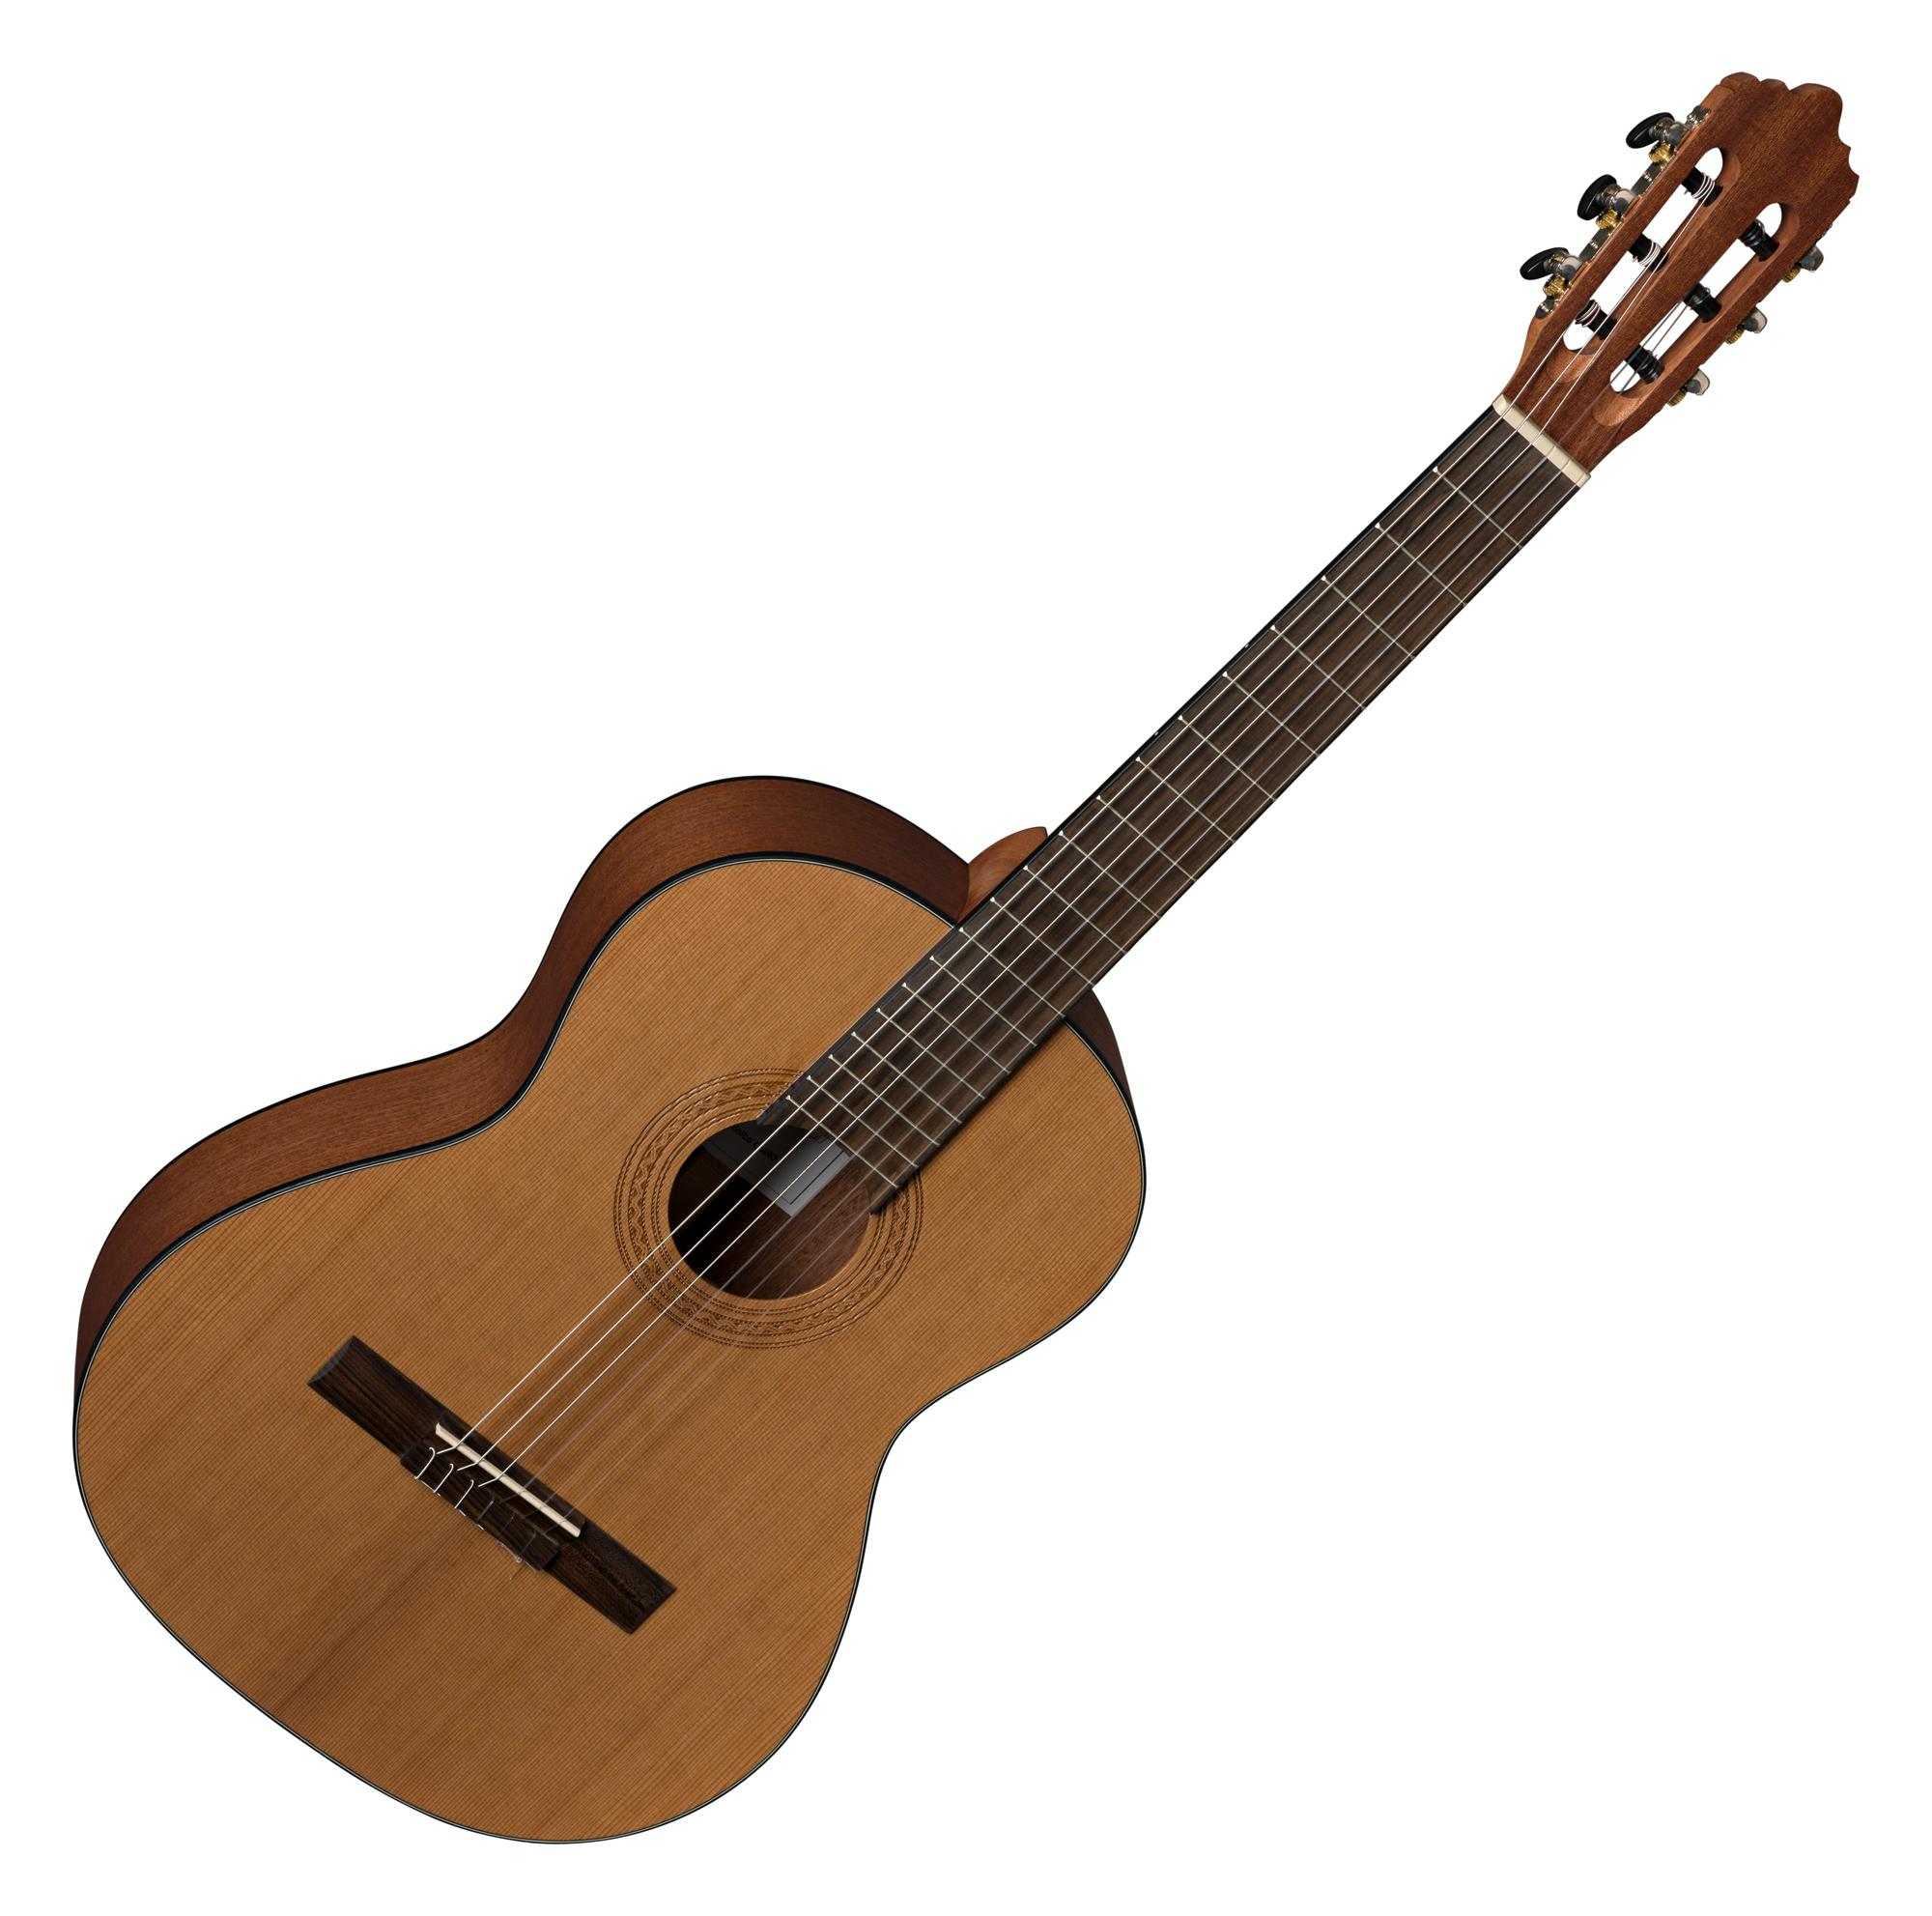 La Mancha Rubinito cm 63 7 8 Konzertgitarre